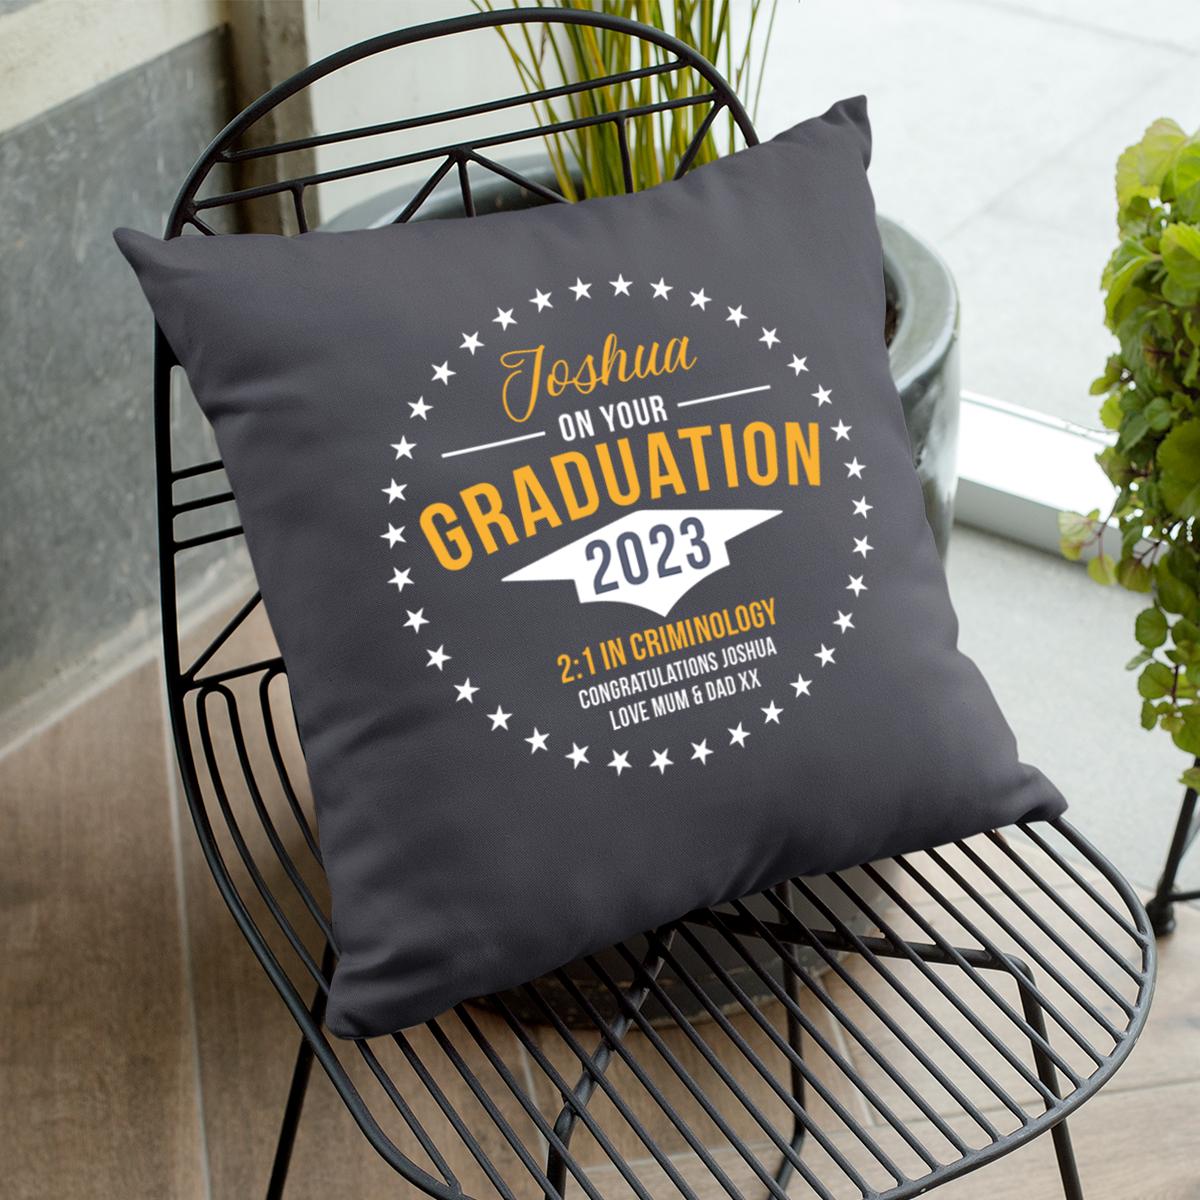 Personalised Graduation Cushion - Graduation Gifts